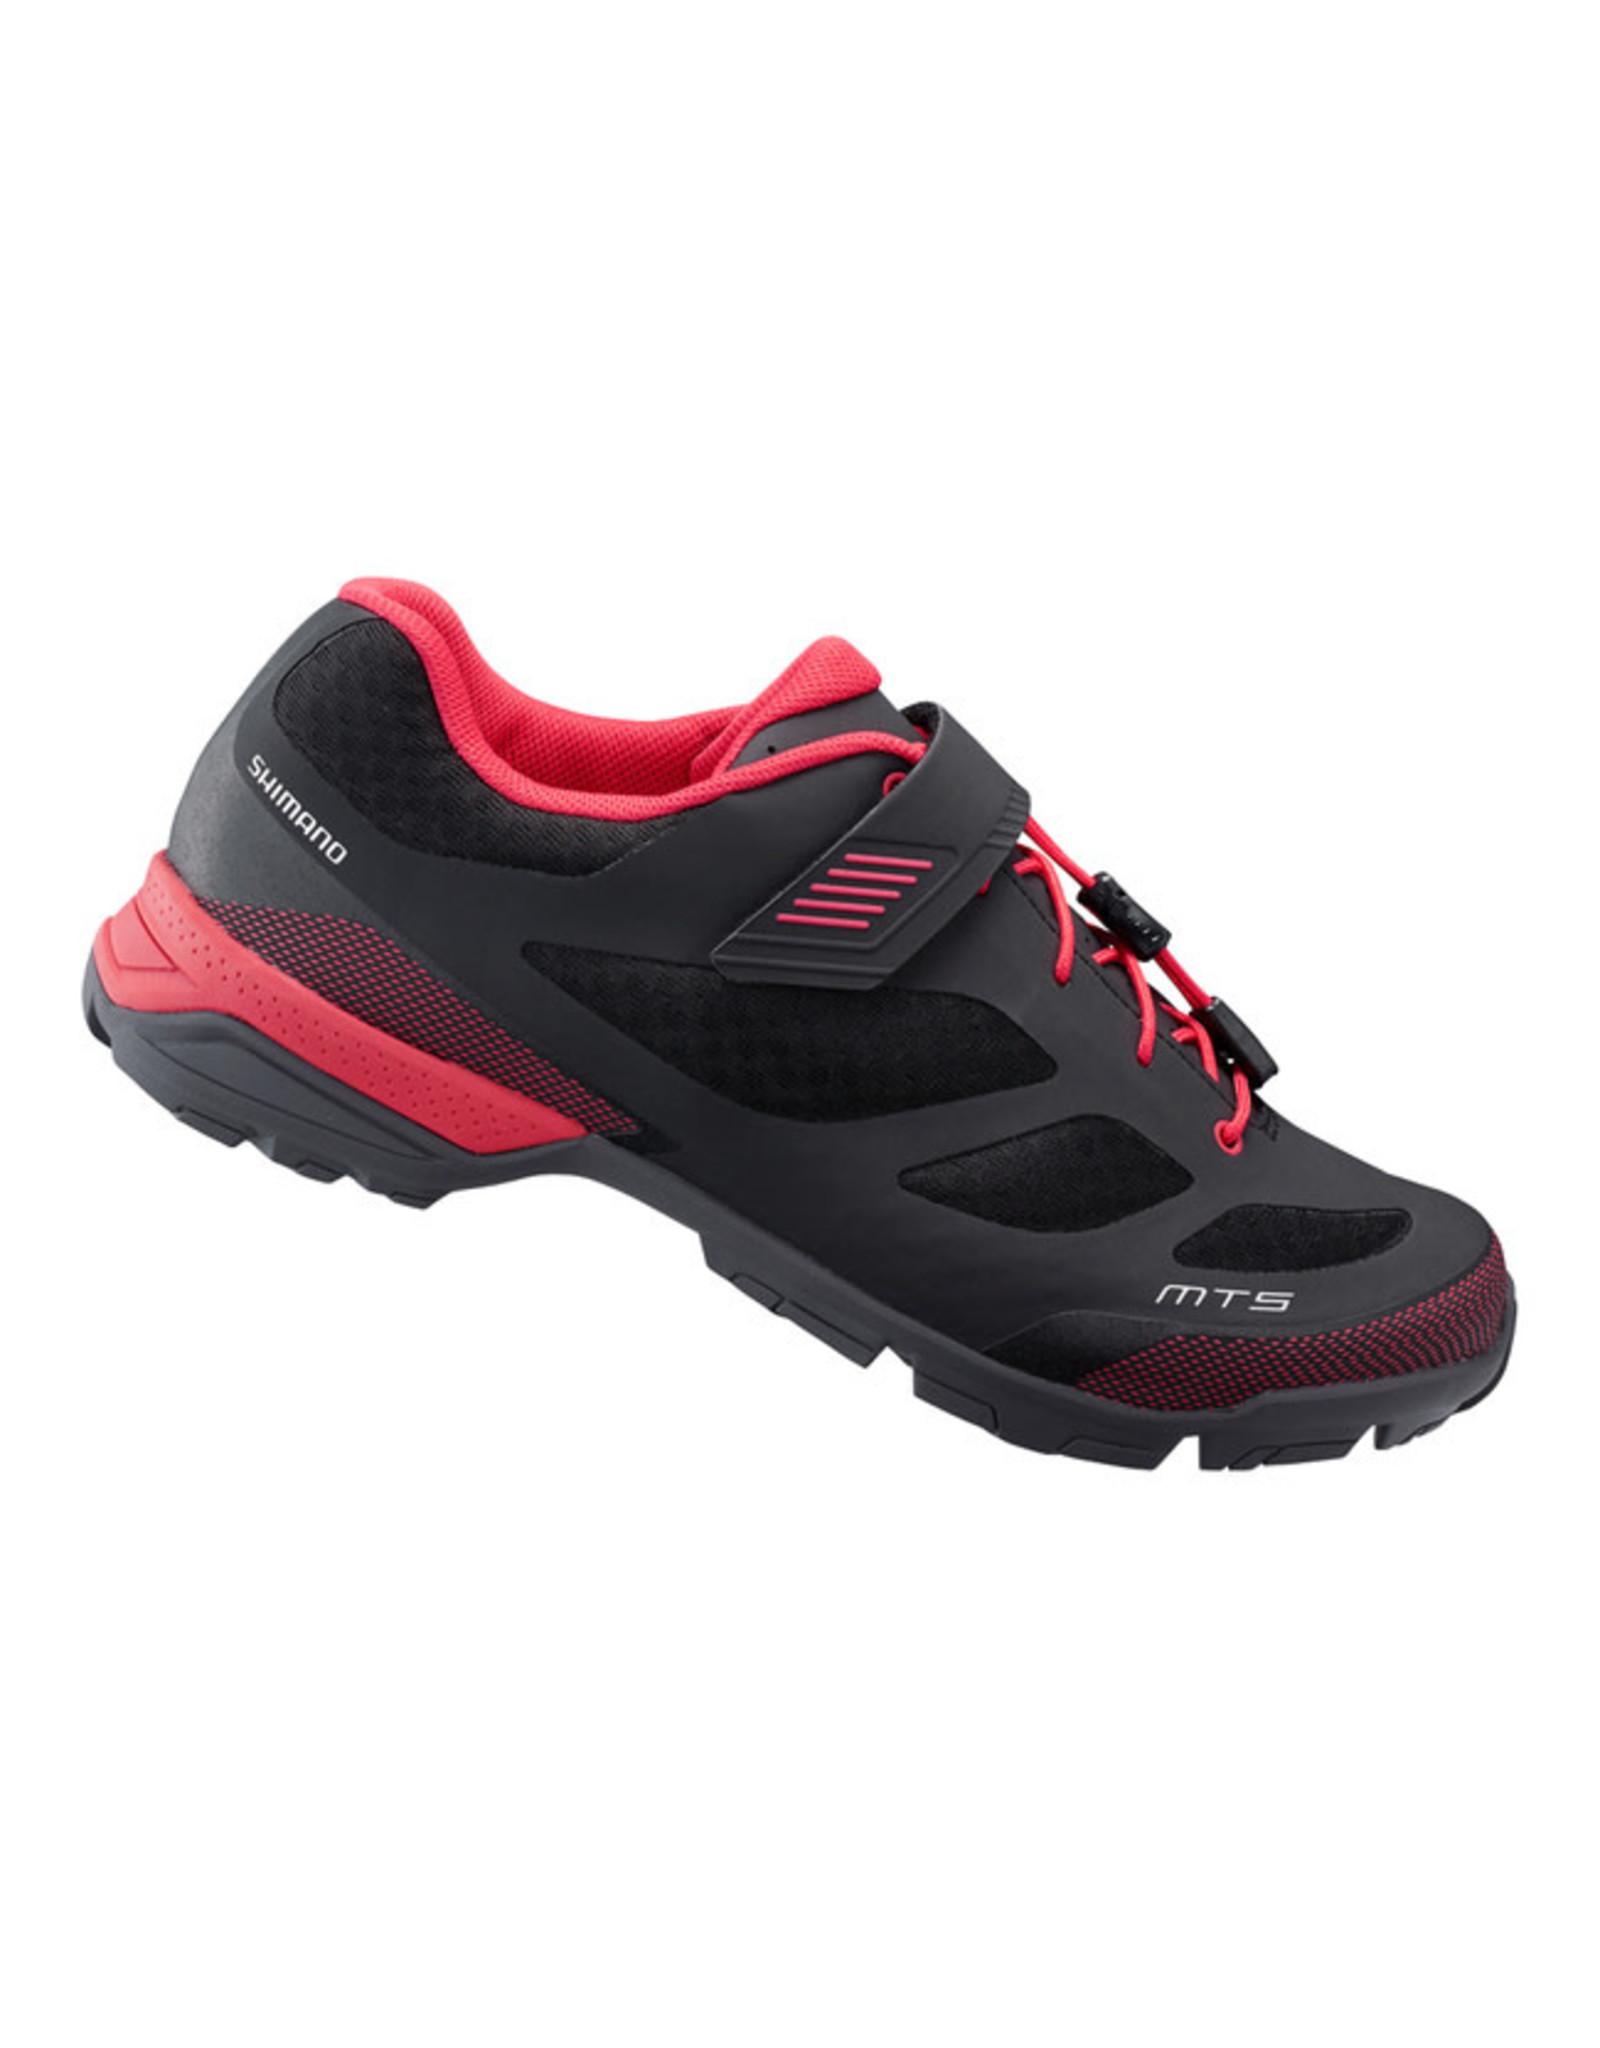 Shimano Shimano MT5 W shoes